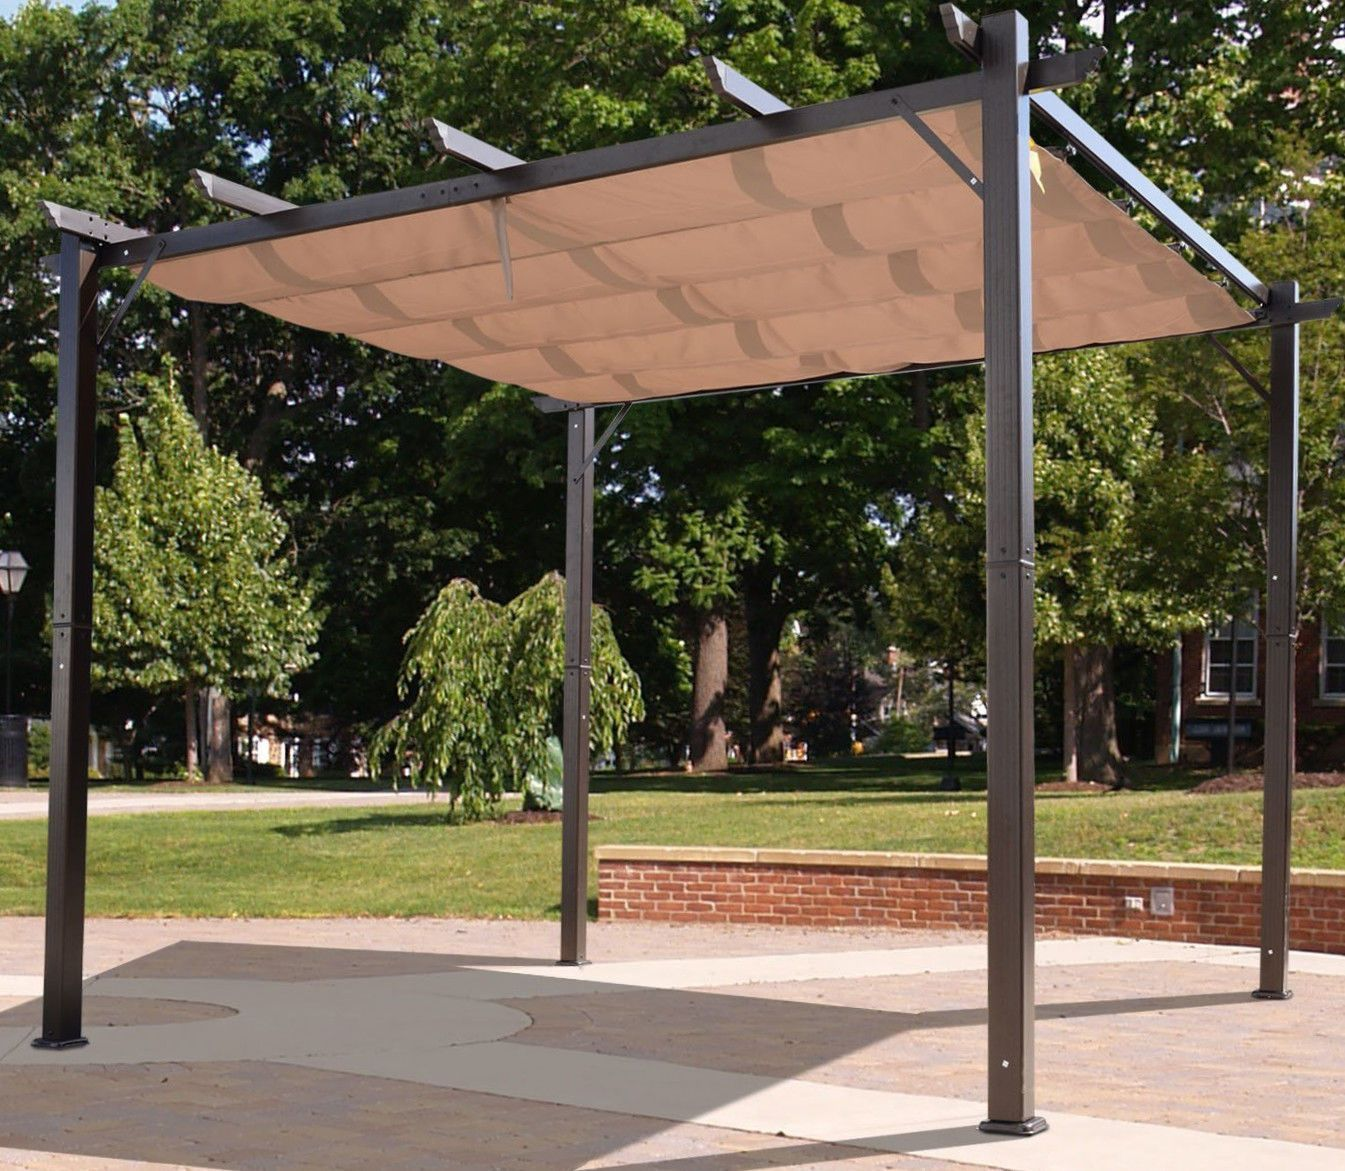 Outdoor Pergola Aluminum Canopy Retractable Shade Shelter x